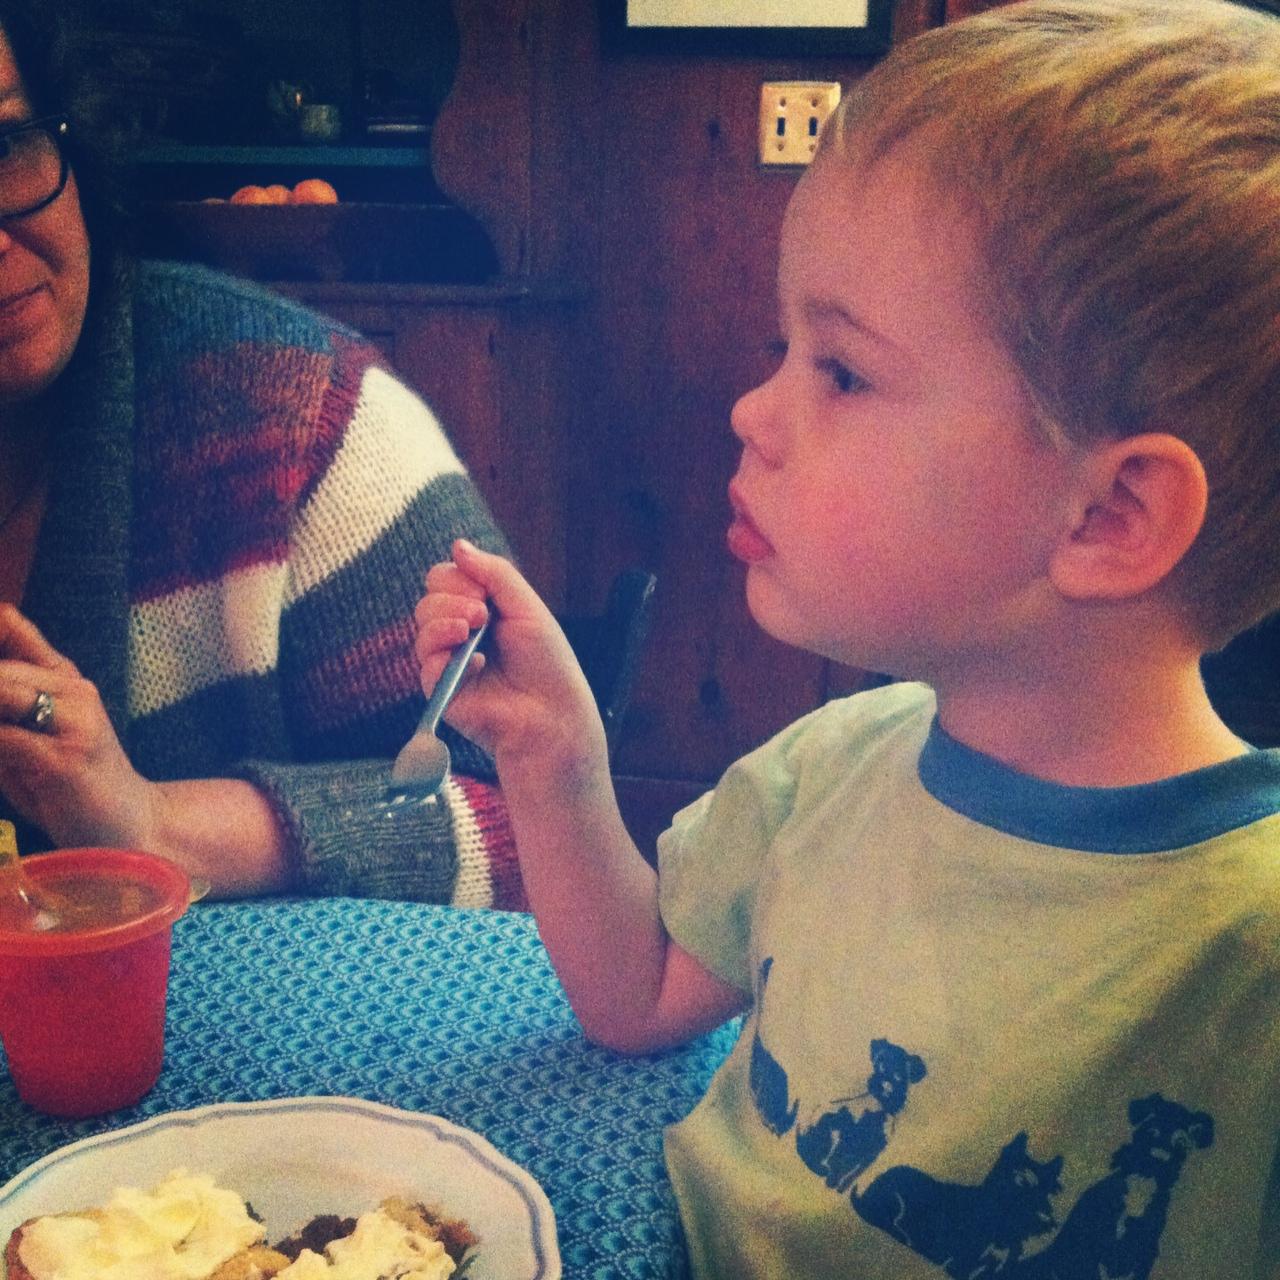 Little man enjoyed the pie!